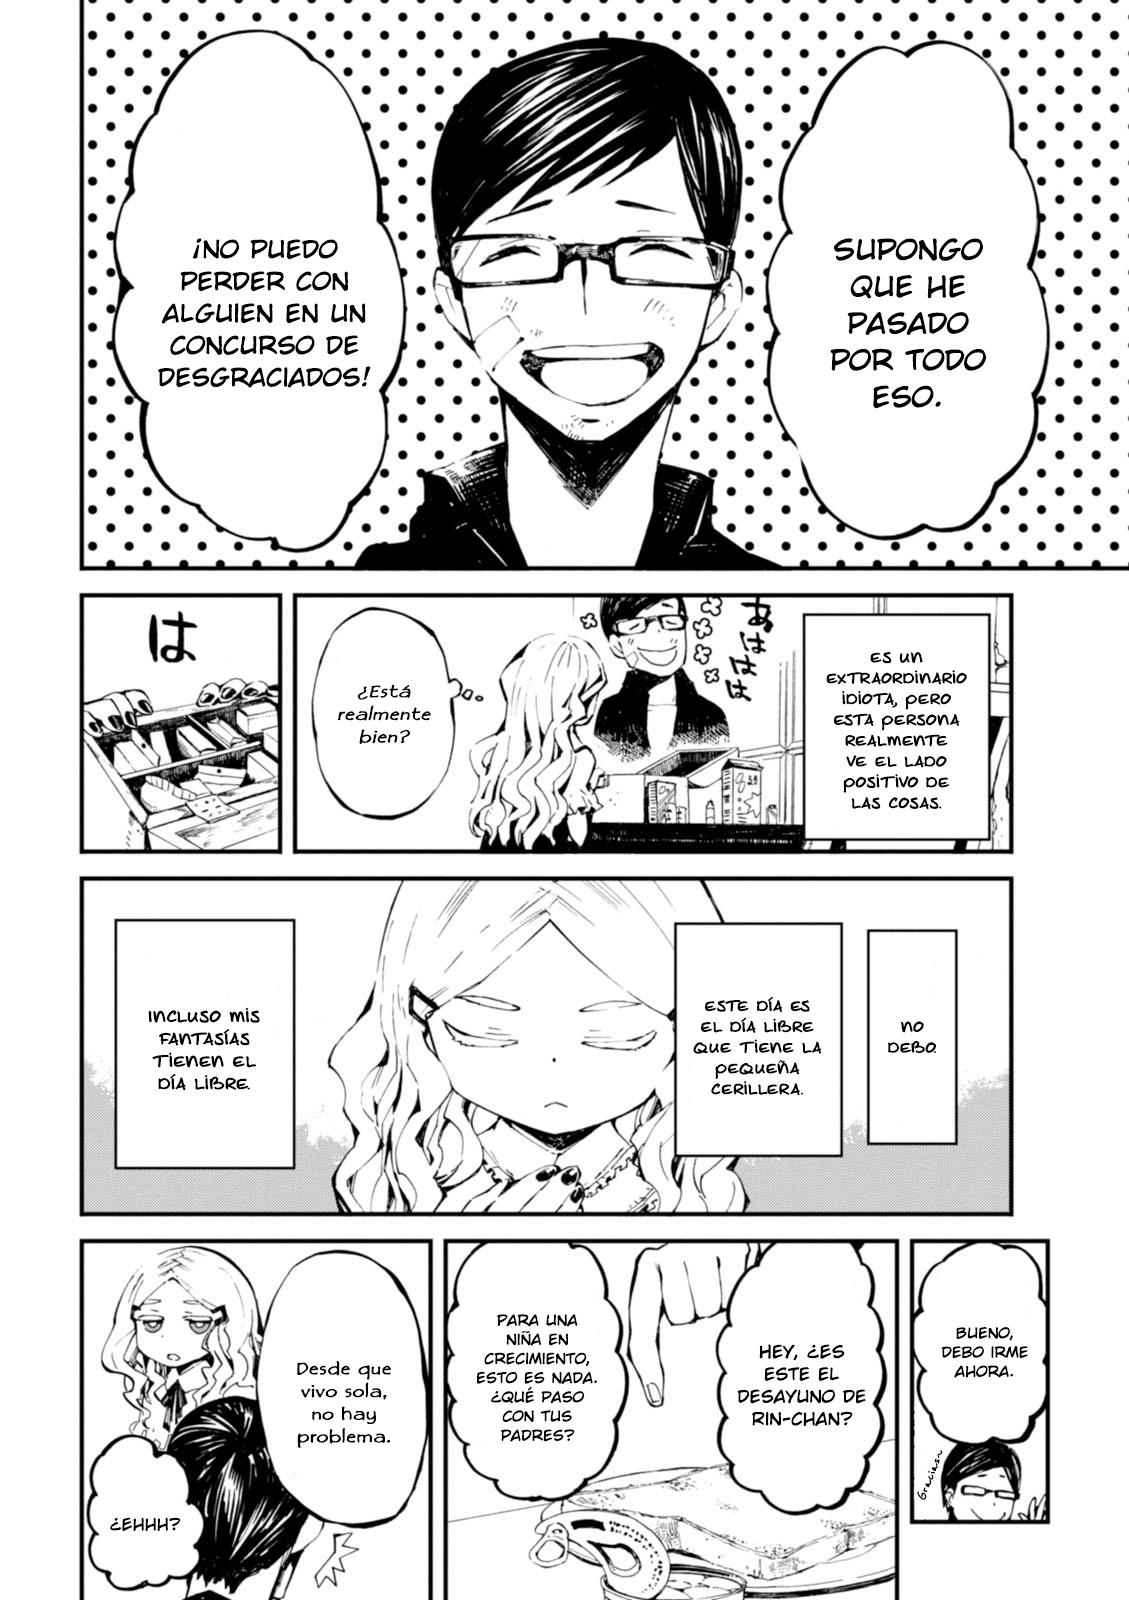 http://c5.ninemanga.com/es_manga/27/17755/472475/ae5e9154ff3754a3a942ca2417701560.jpg Page 9